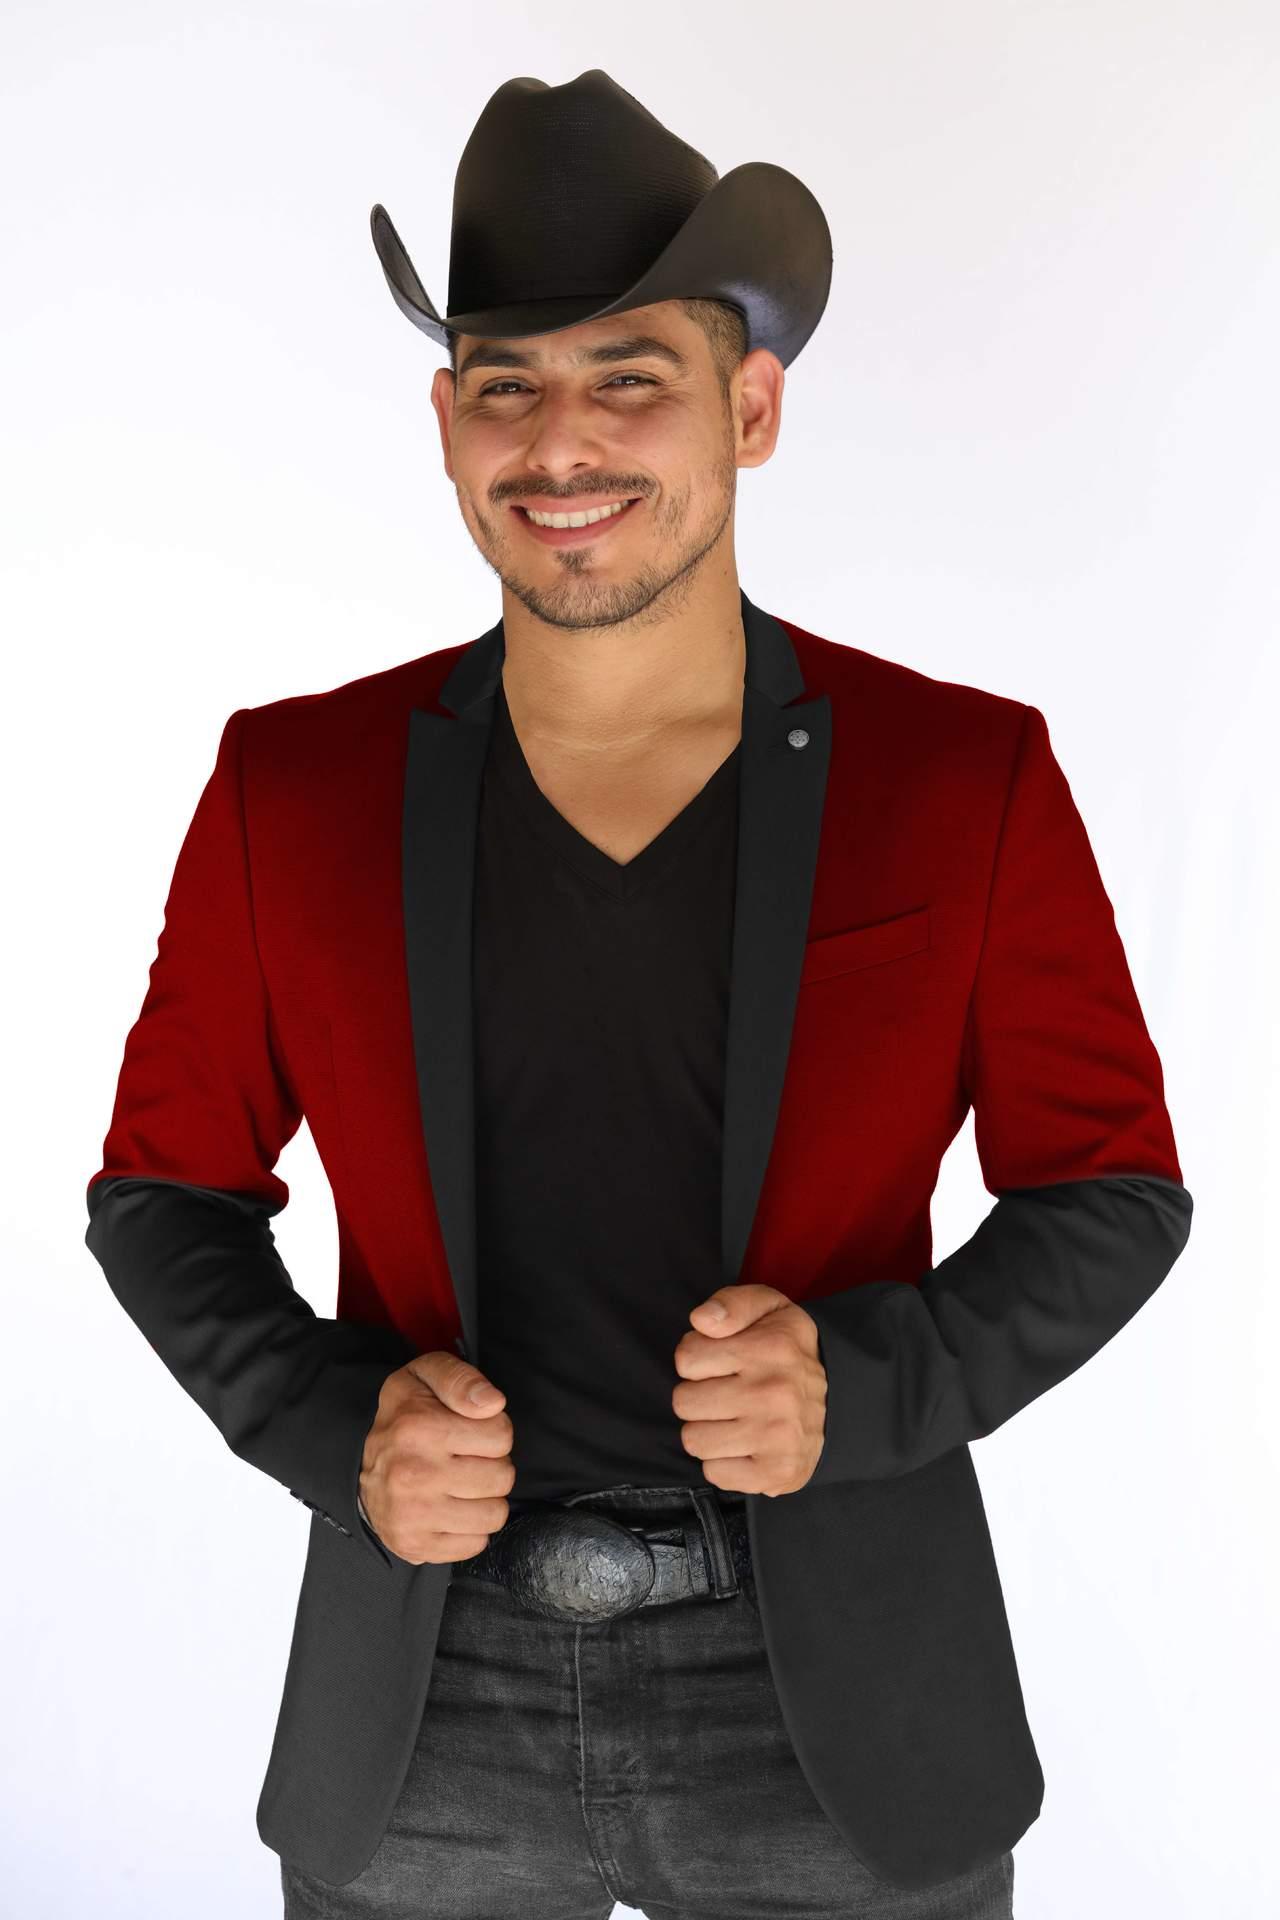 Espinoza pugna por exportar al extranjero música mexicana